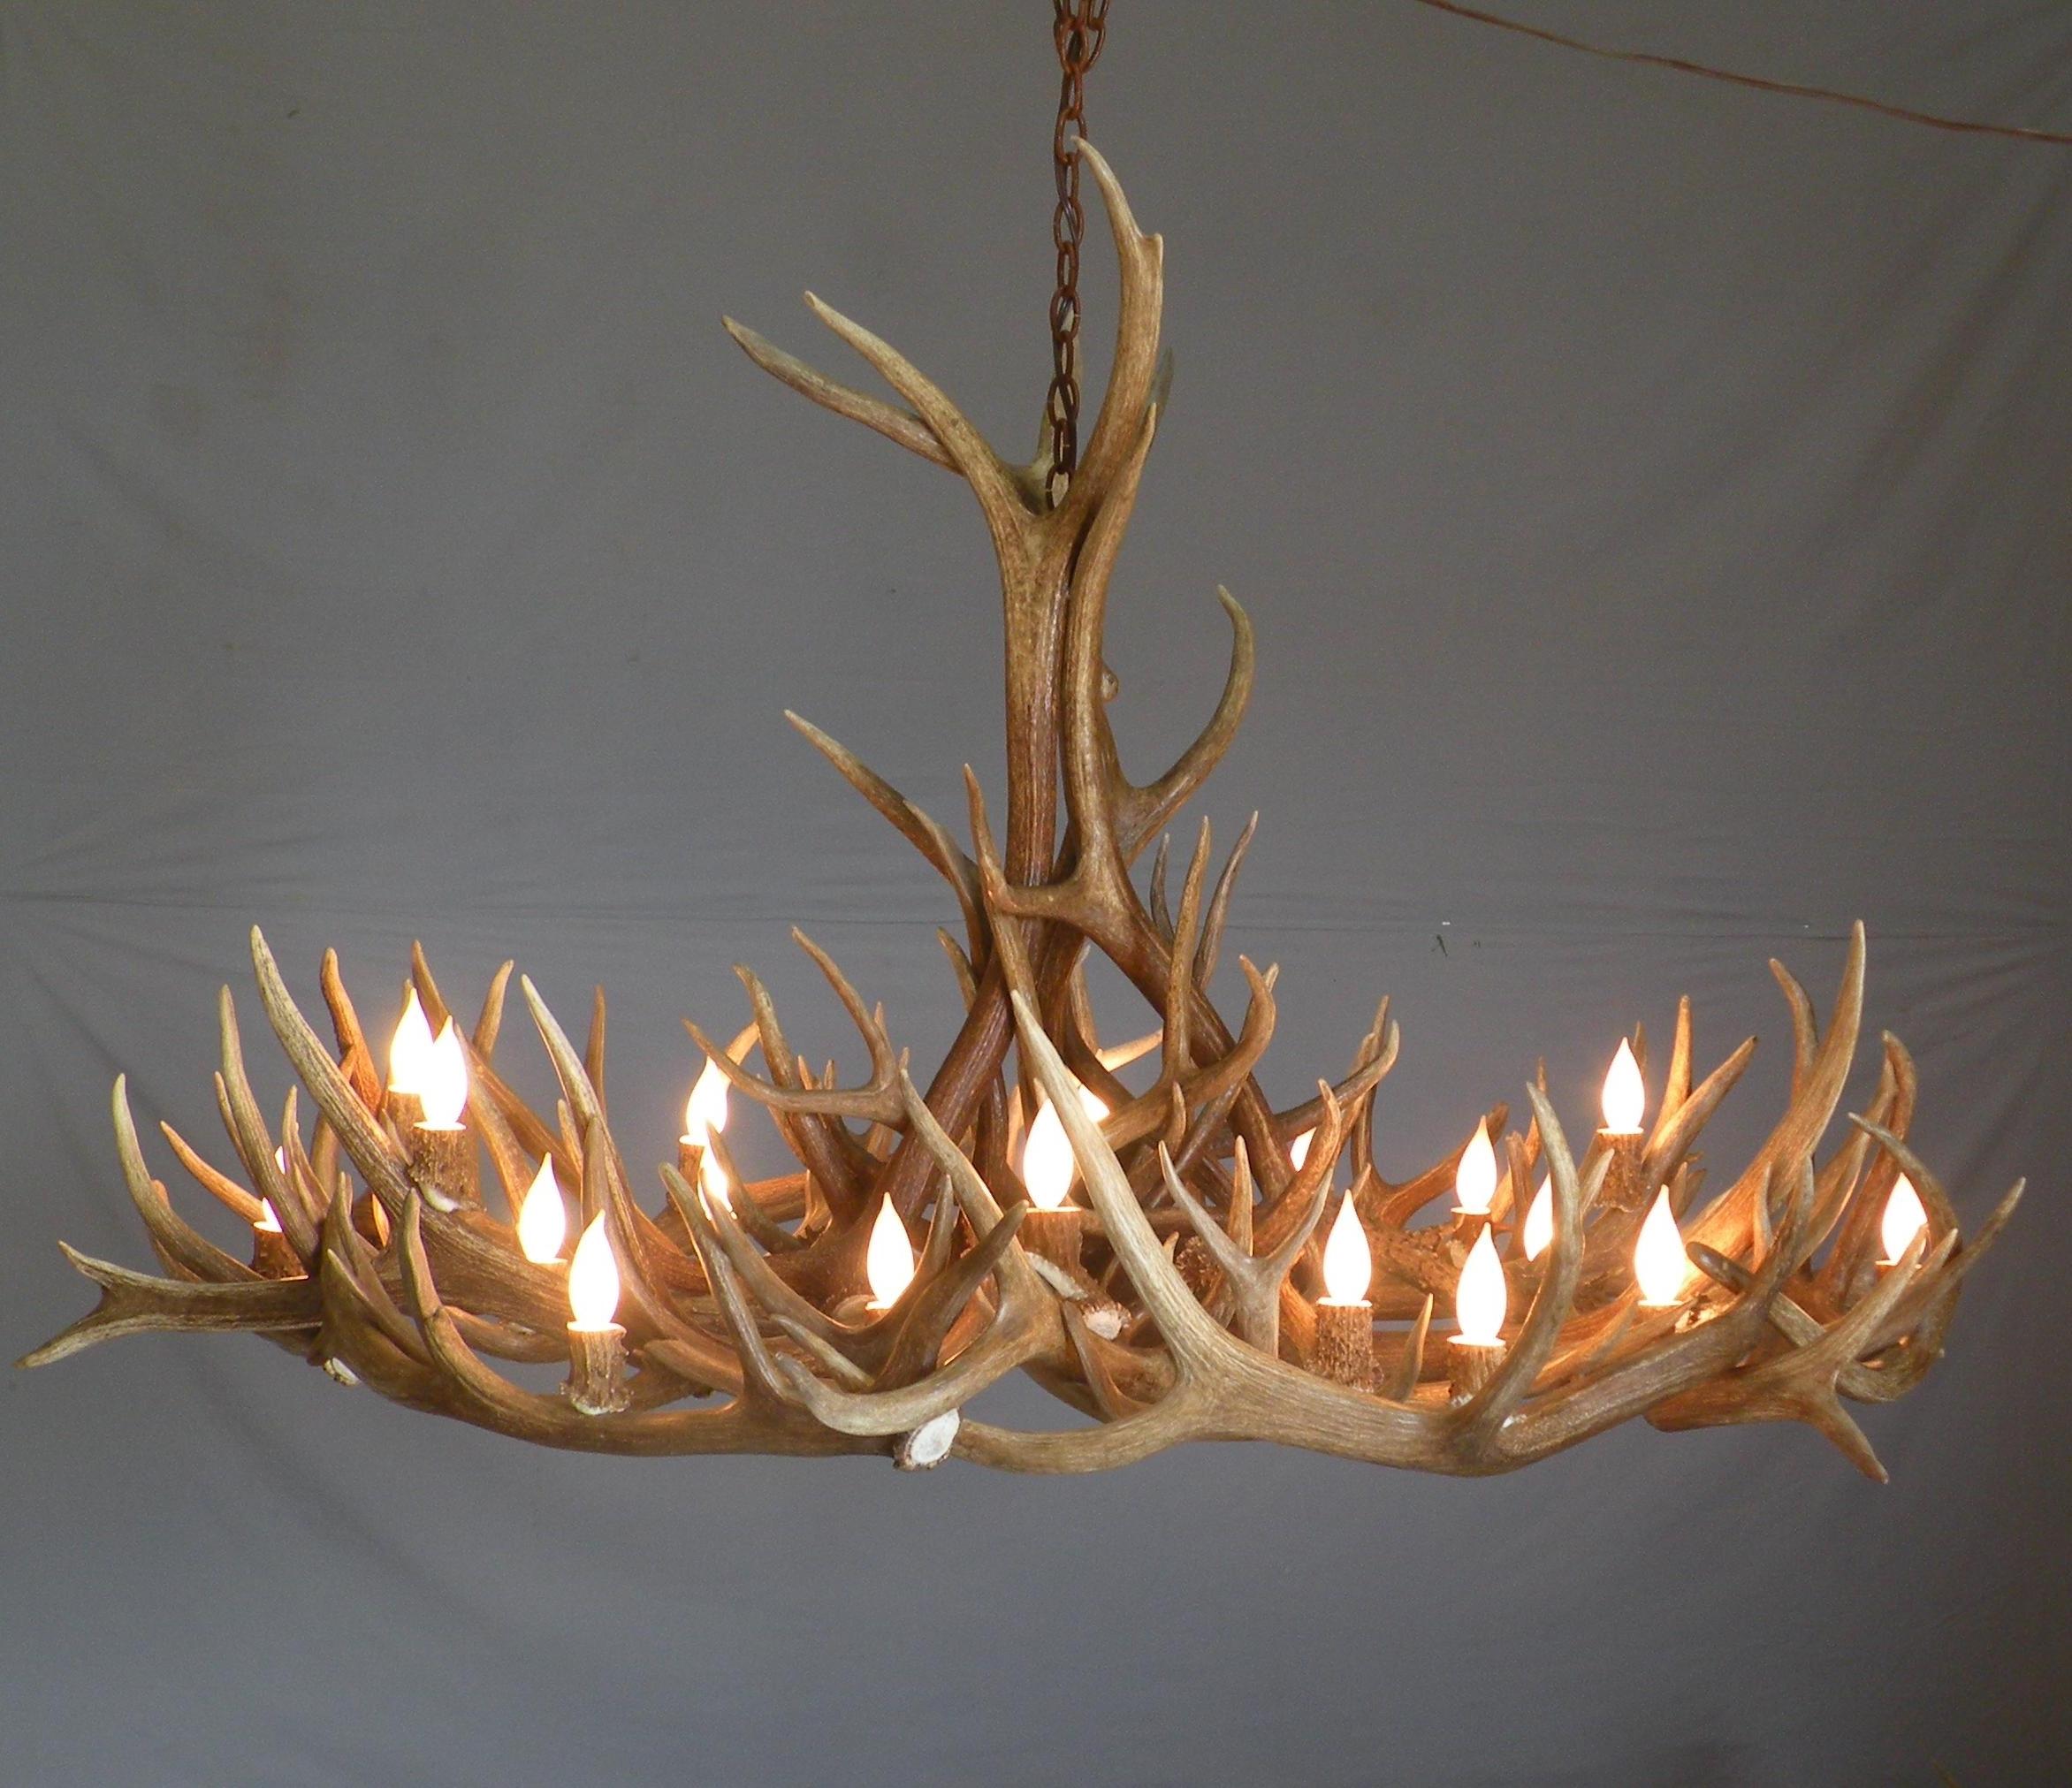 Stag Horn Chandelier In Well Known Lighting: Elk Antler Chandelier For Inspiring Unique Lighting Design (View 4 of 15)